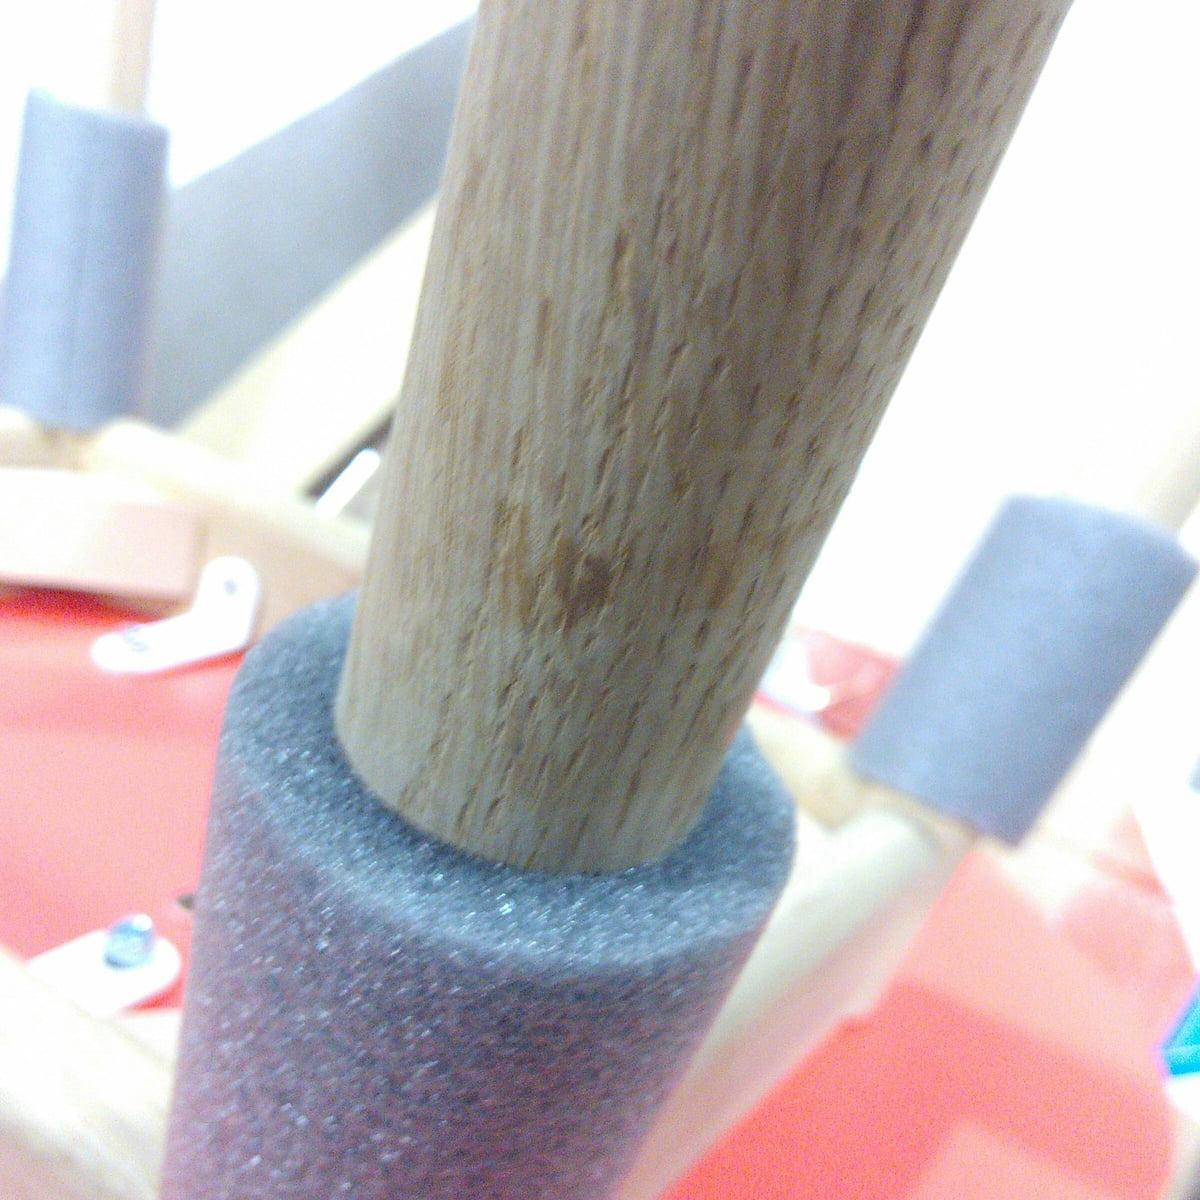 Design Sale - Hay - About A Chair AAC 12, Eiche geseift / korallenrot (Filzgleiter)